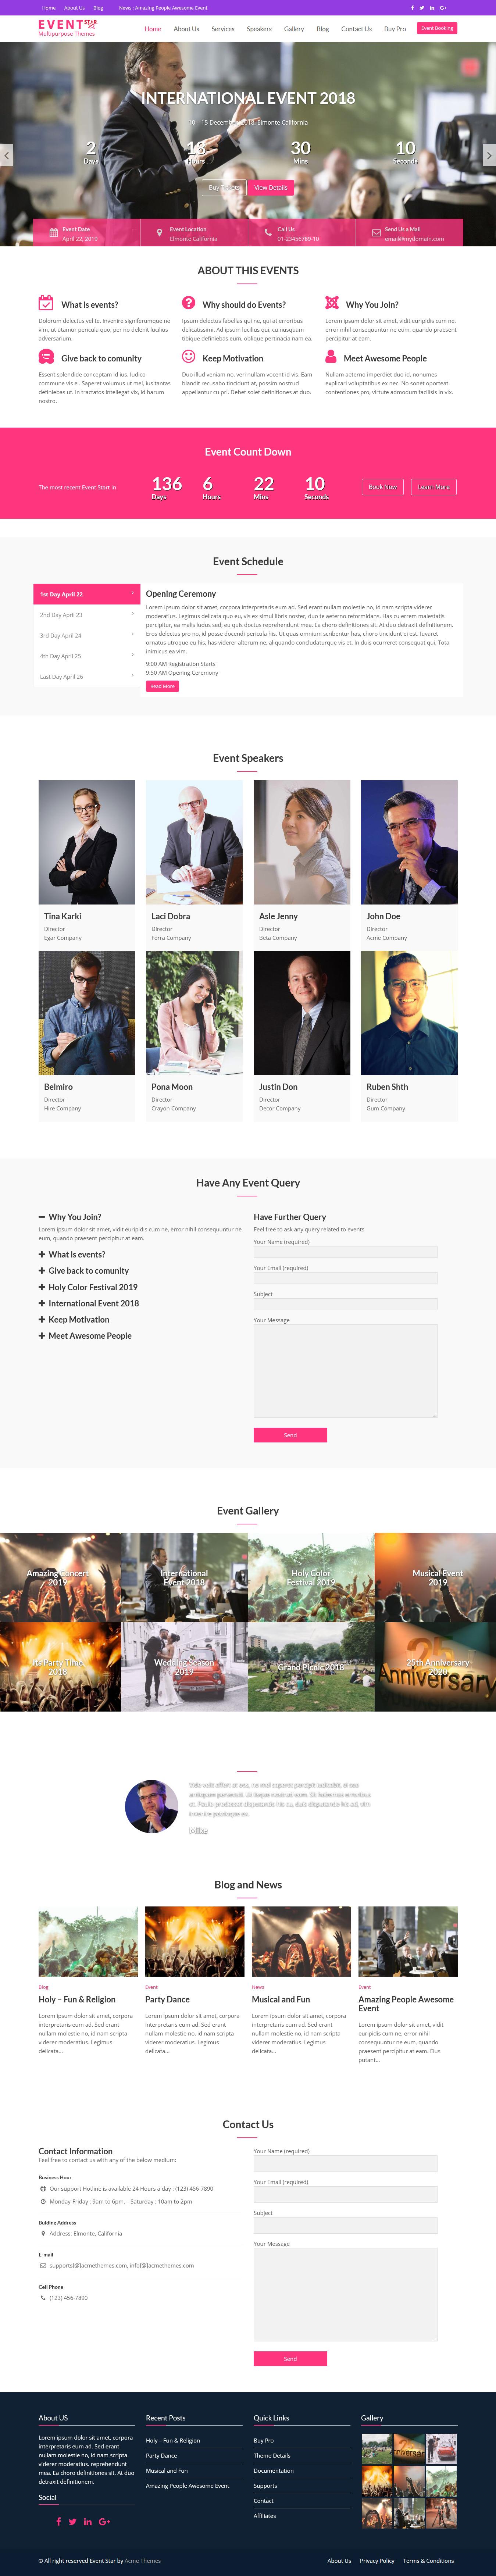 Event Star - Best Free Event WordPress Theme